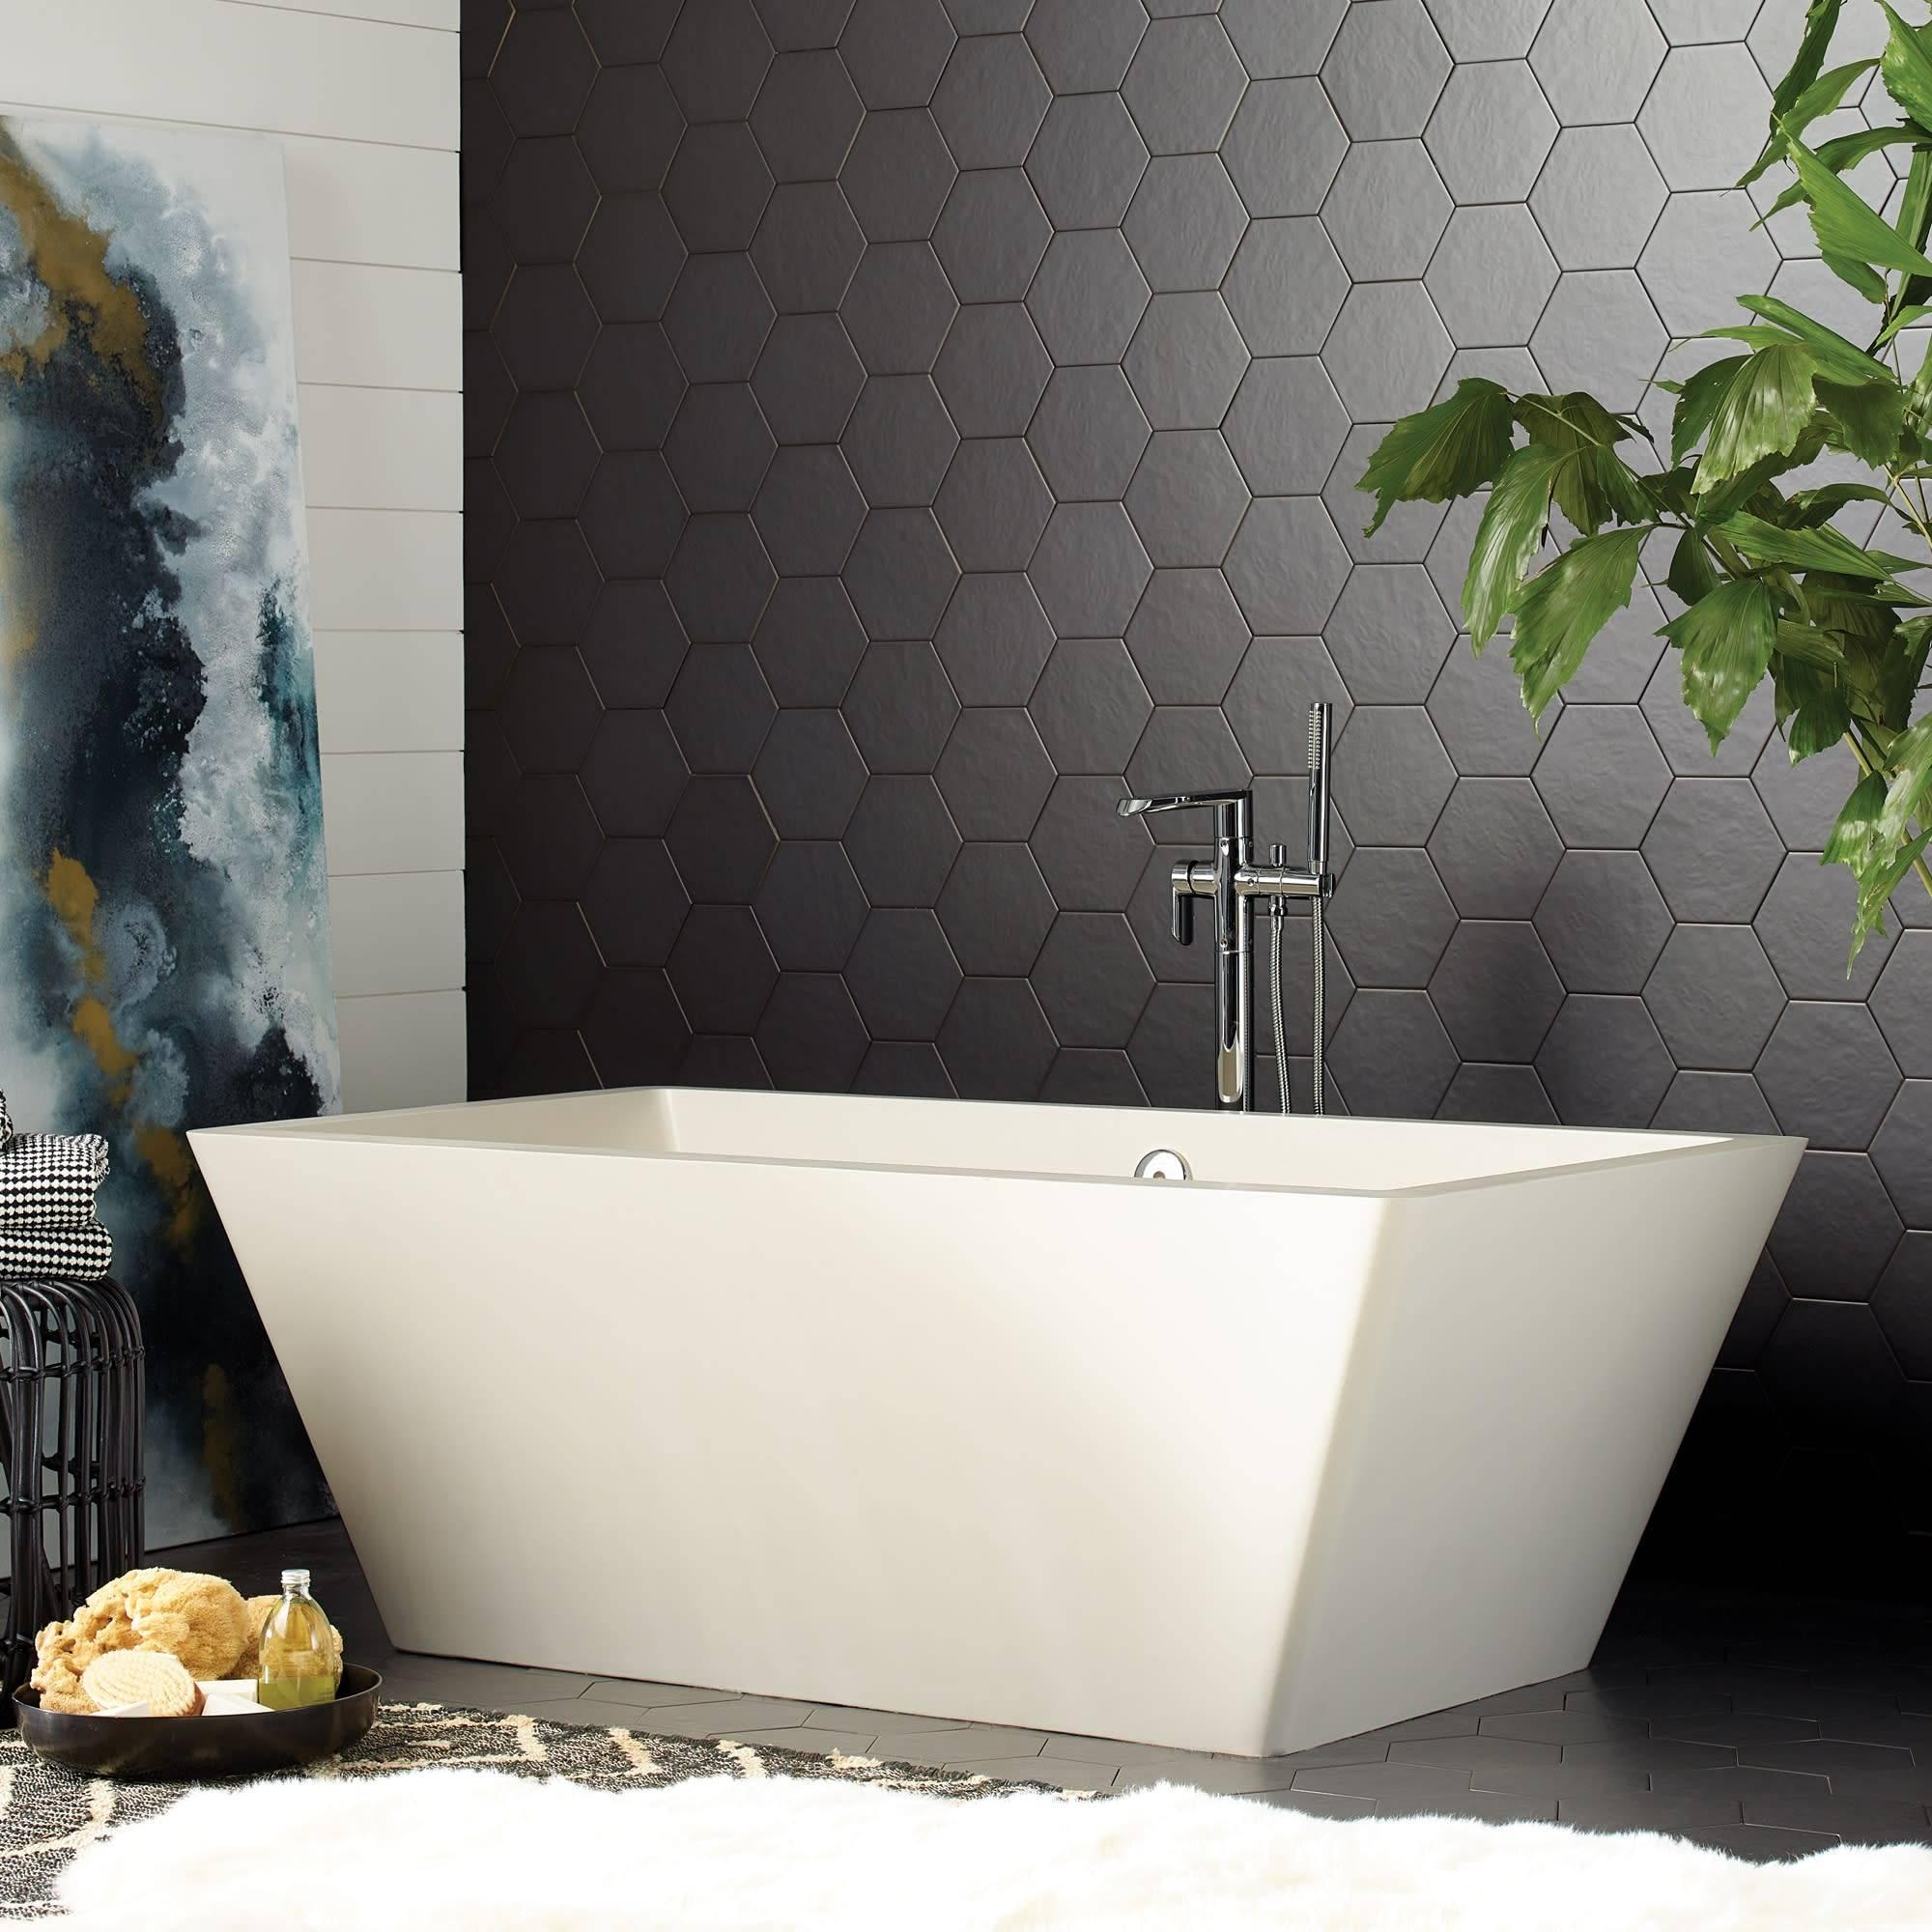 Mendocino Concrete Bathtub Pearl NST6634 P 2000 tixmun